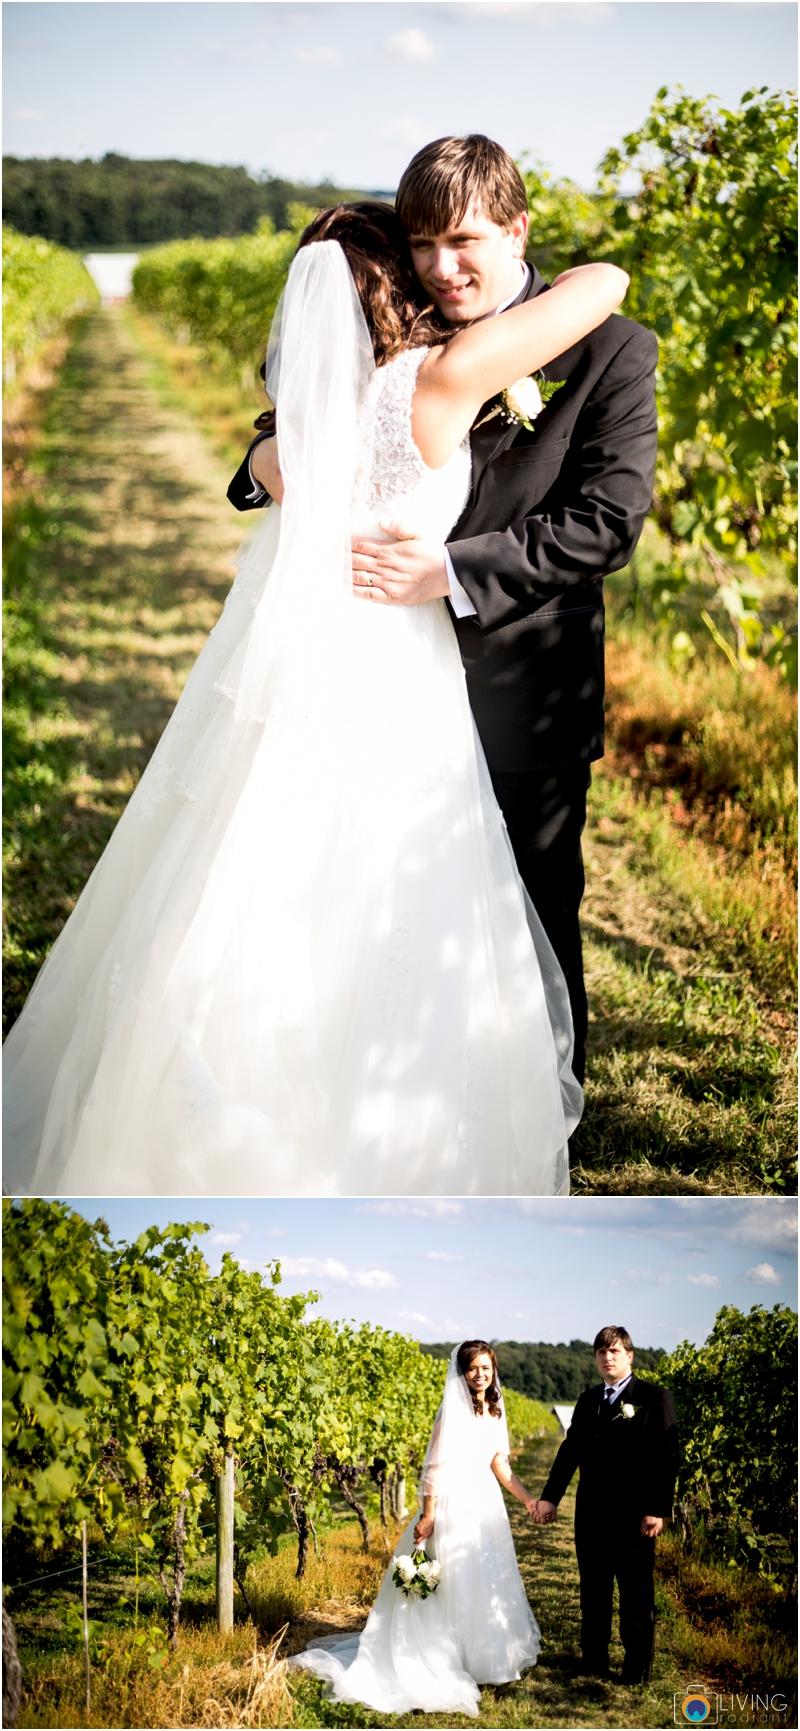 living-radiant-photography-marybeth-brad-wedding-pennsylvania-best-wedding-photographer_0017.jpg